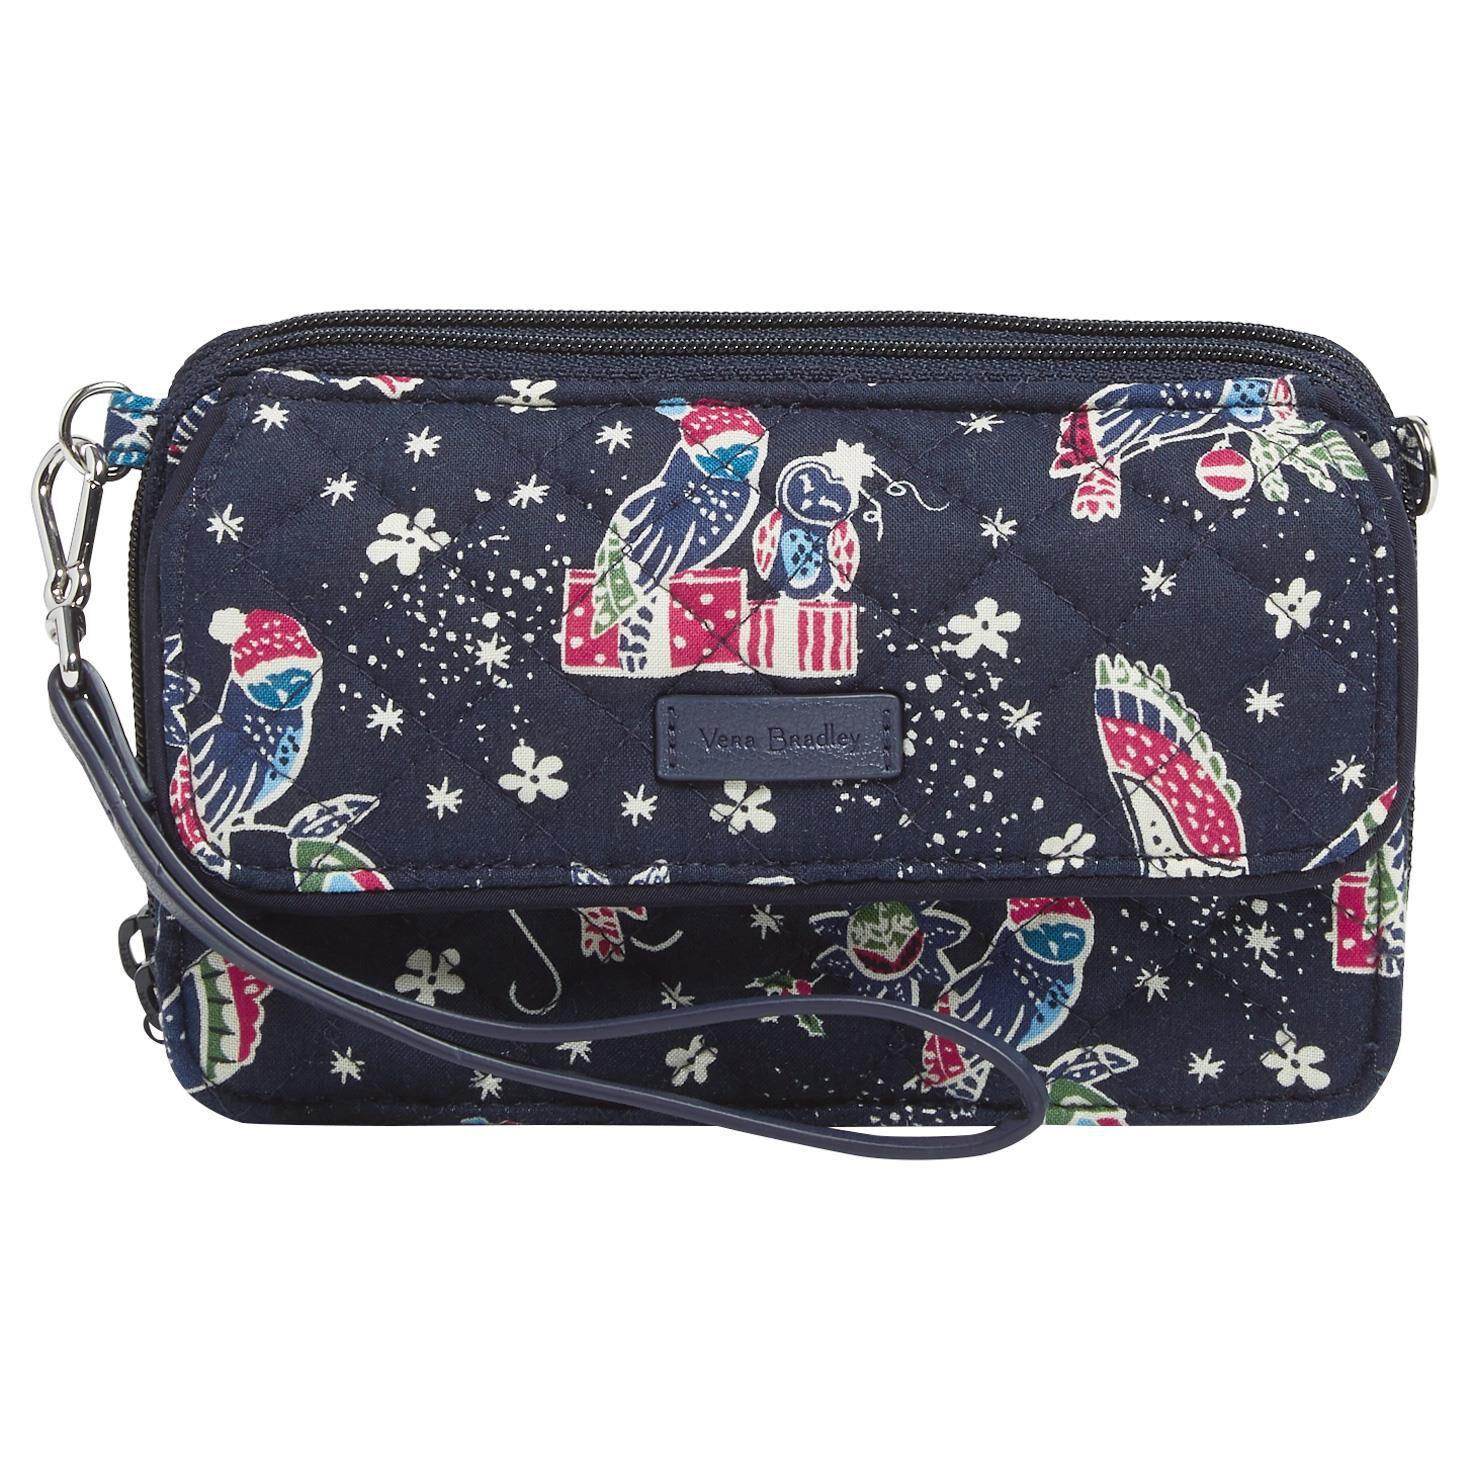 70b633084e88 Vera bradley rfid allinone crossbody purse in holiday owls root source  image jpg 512x512 Hallmark vera